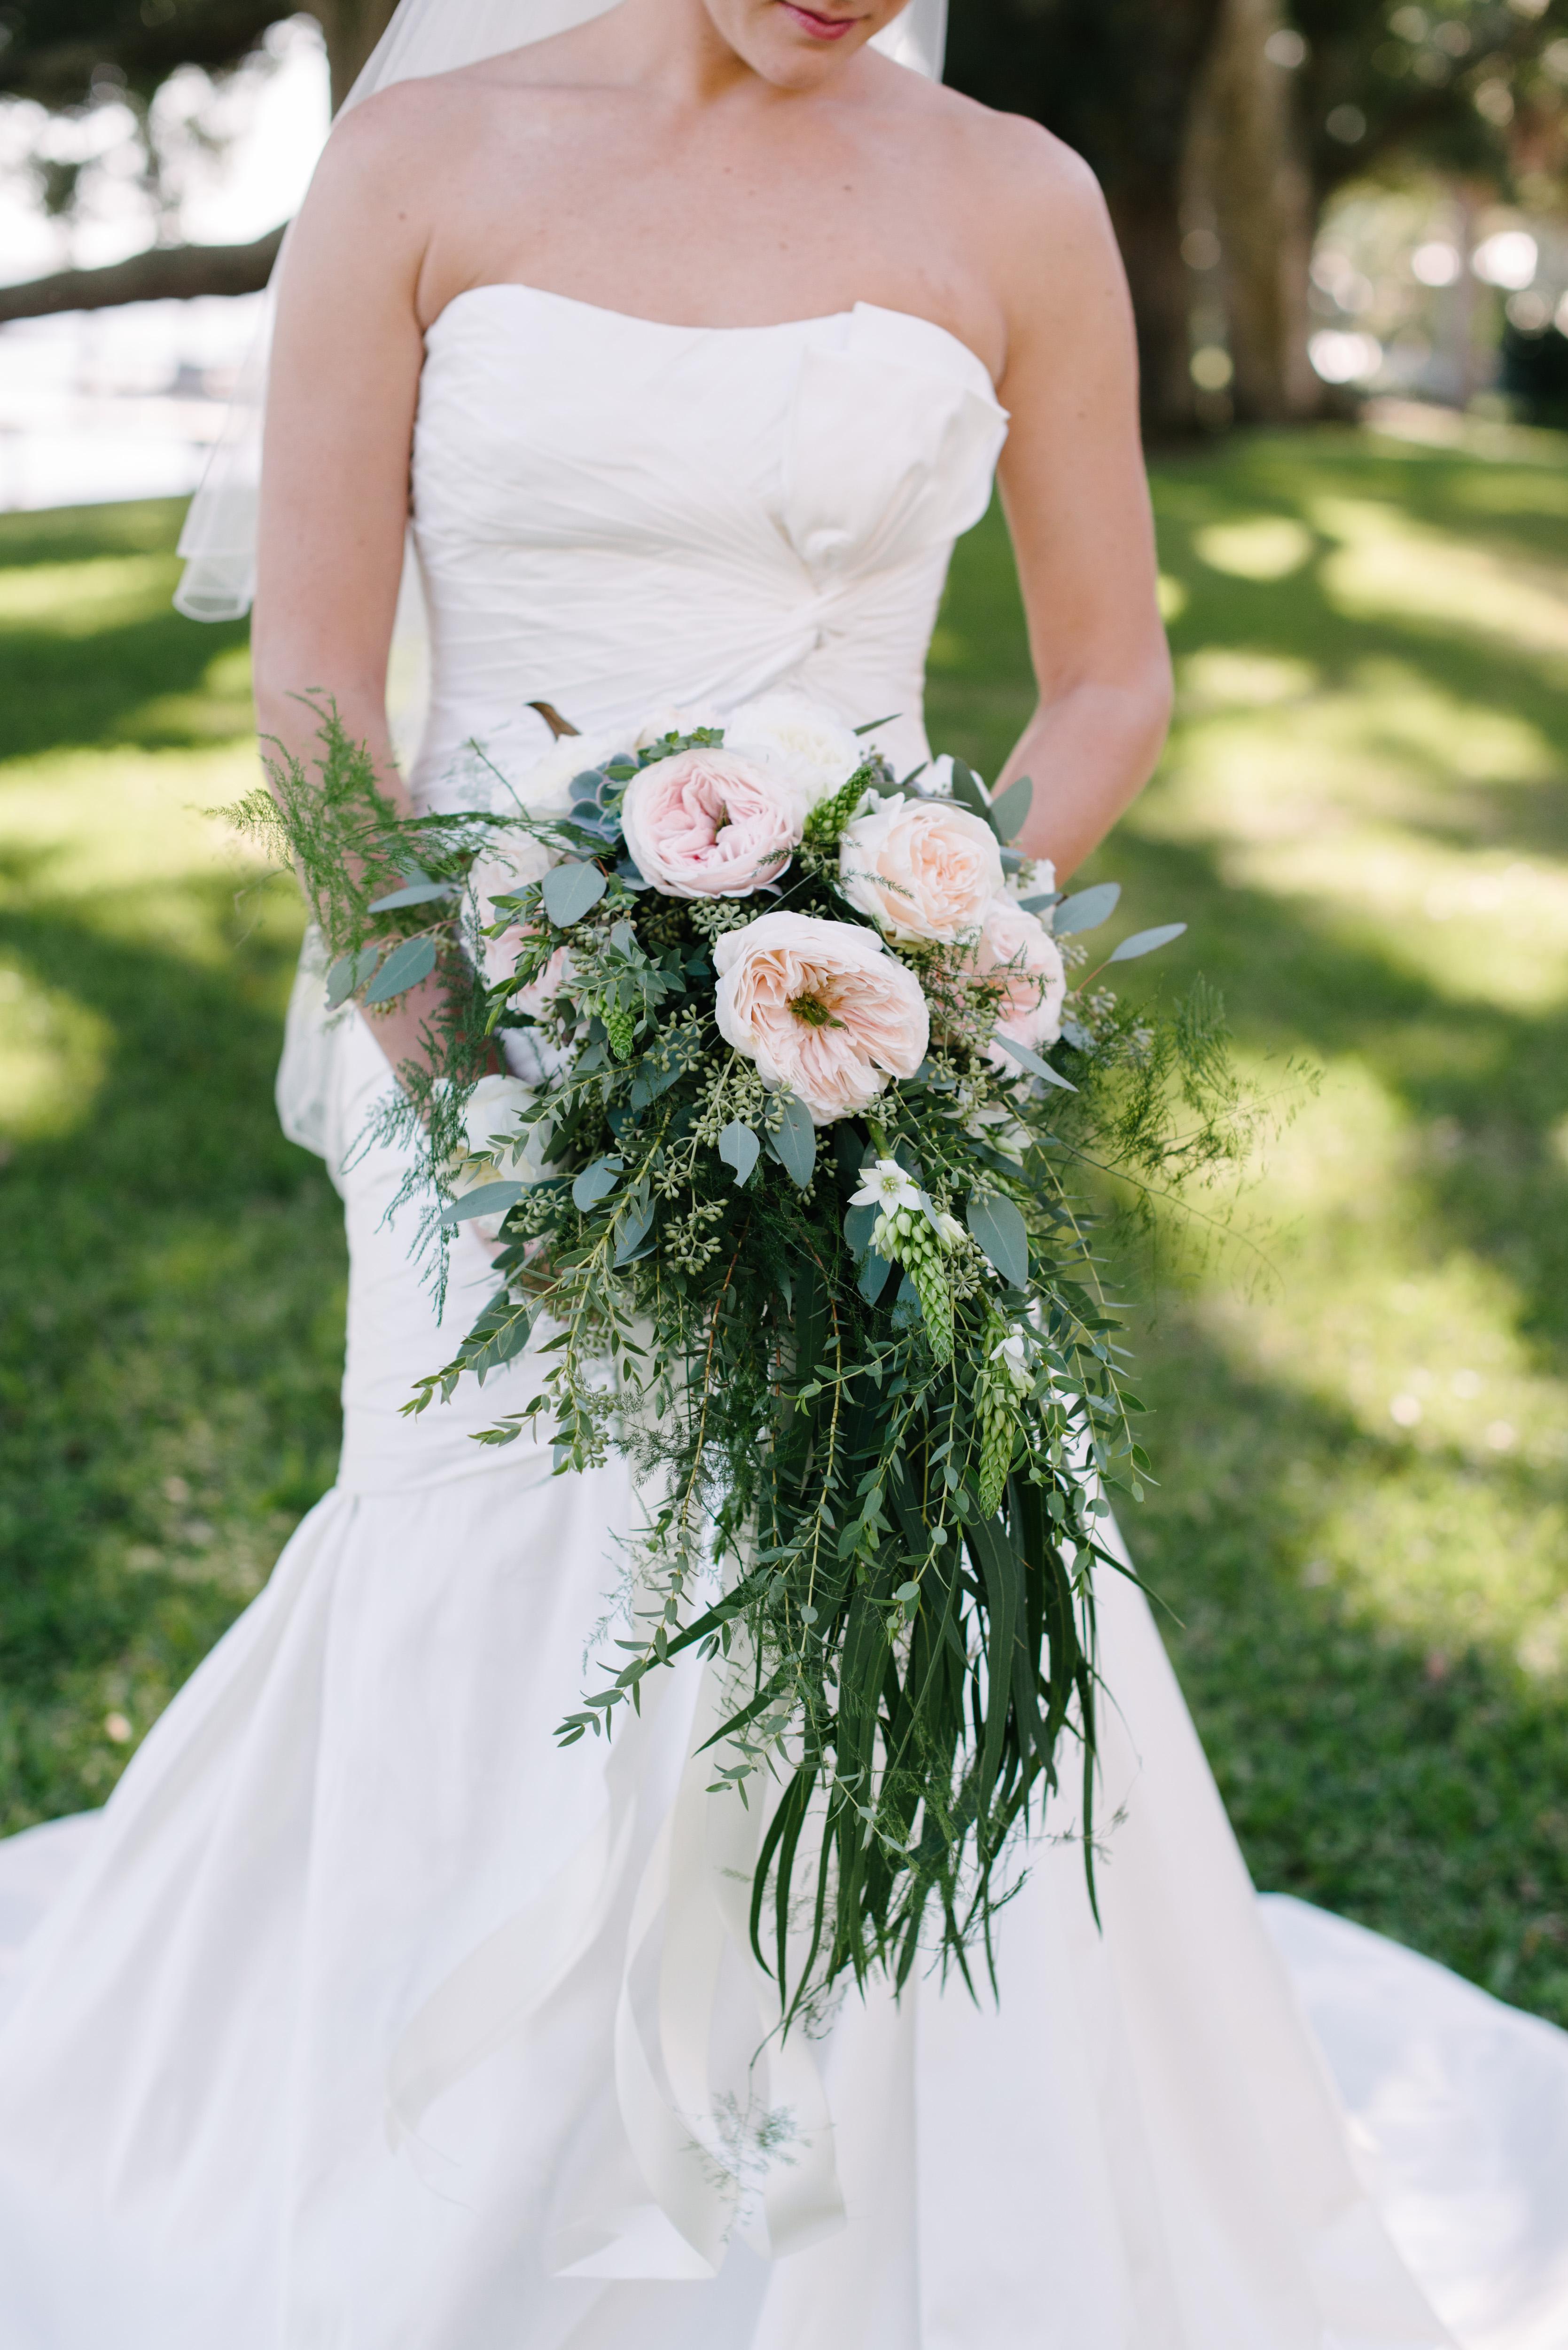 10 Words to Define Your Wedding Style - WeddingWire